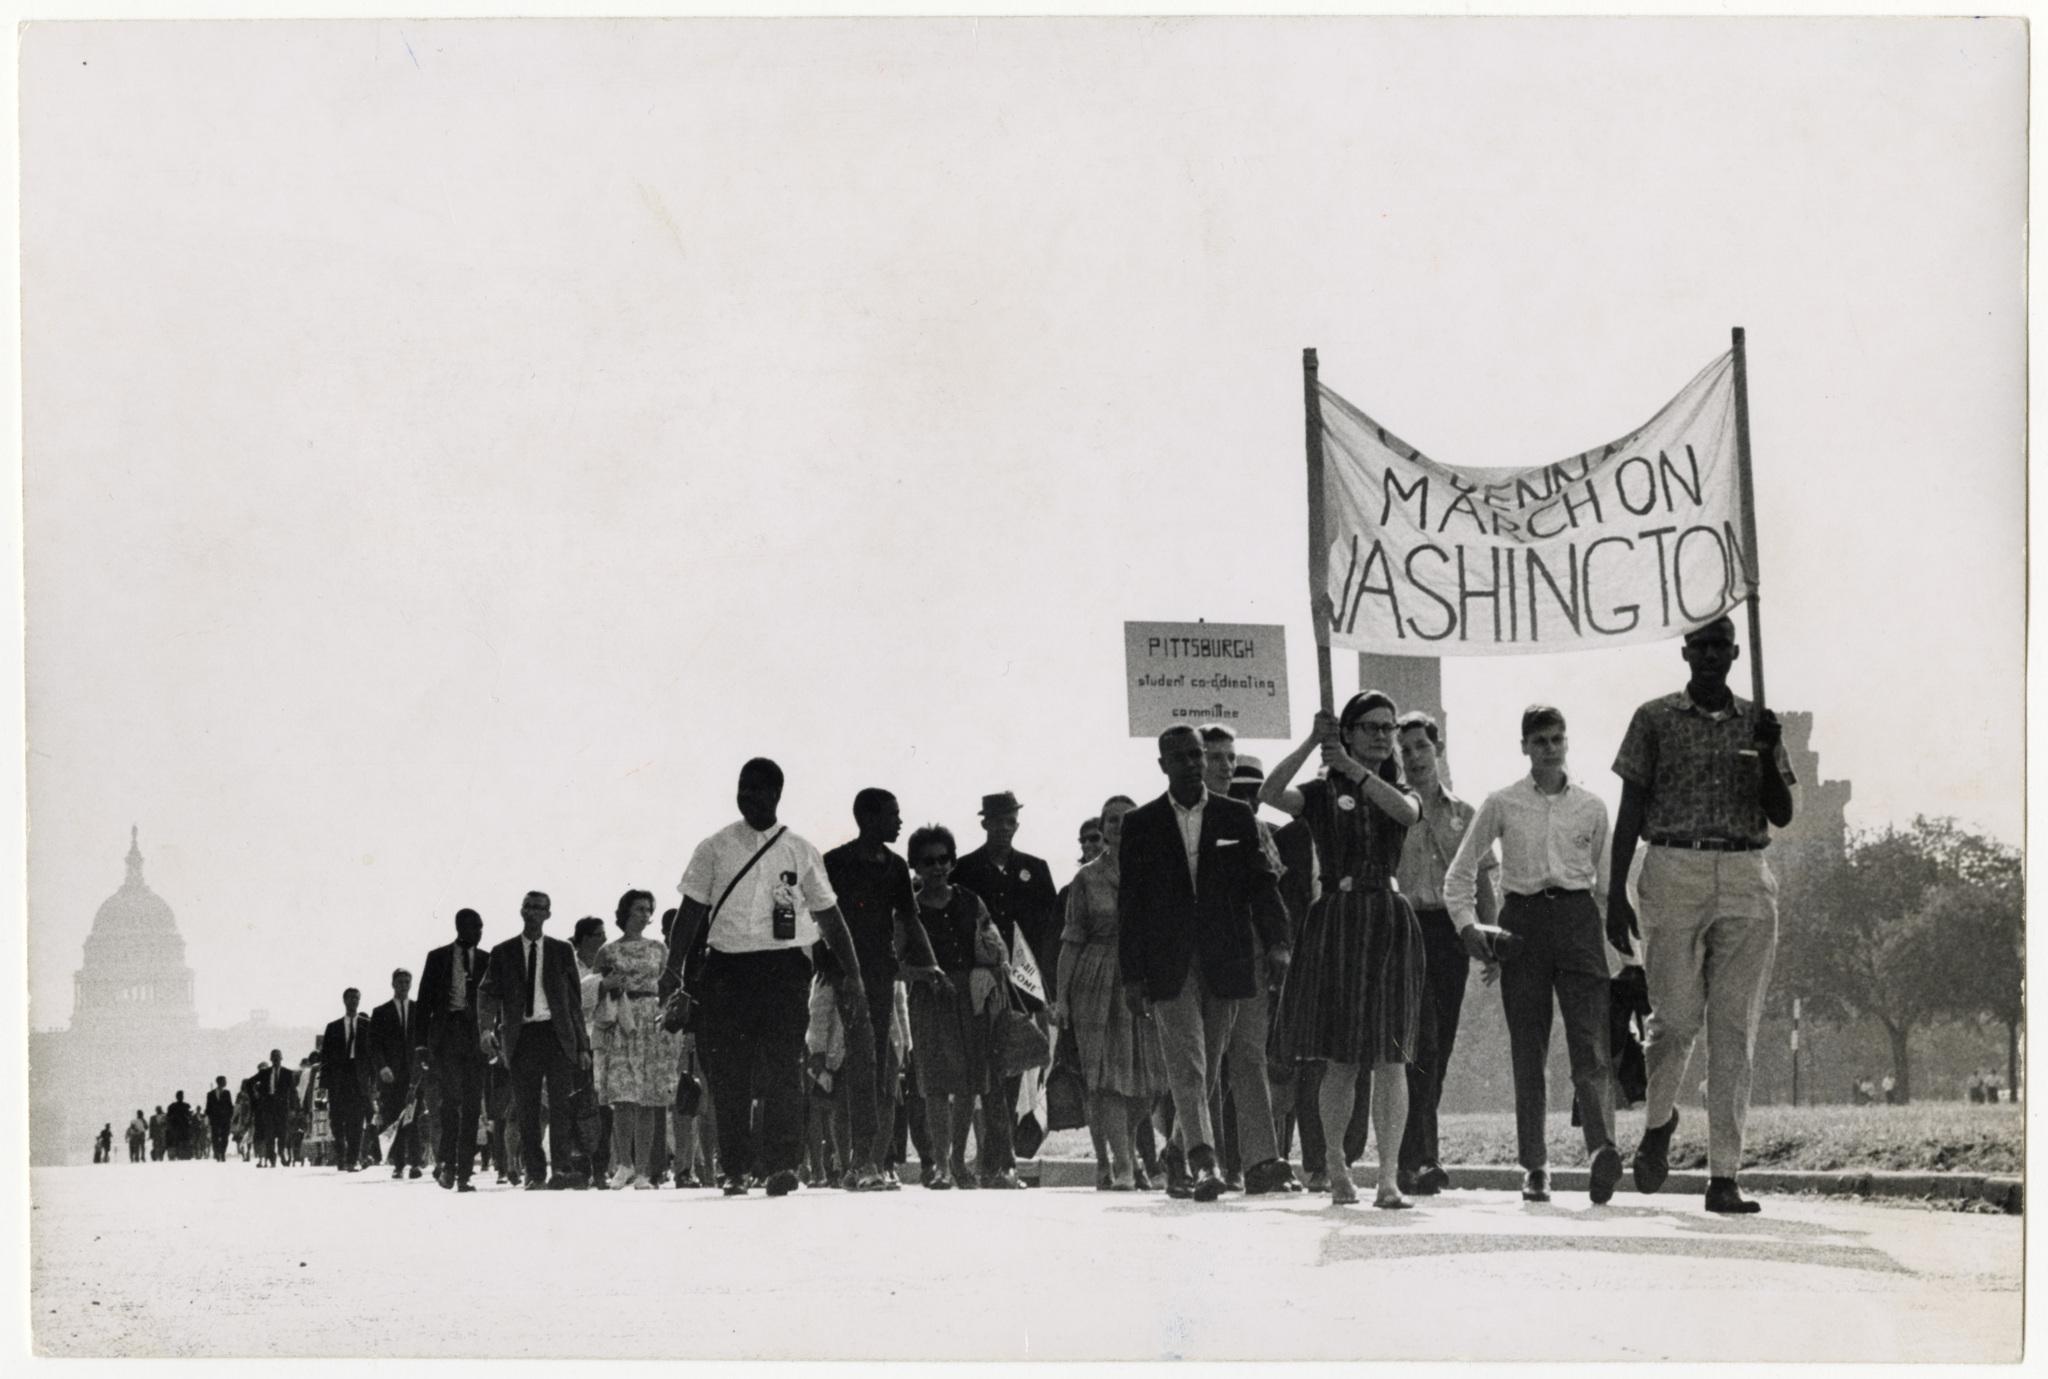 the march on washington 1963 arc identifier 49737 / local identifier 3063394 scenes from civil rights march in washington, dc, august 1963 people walking up sidewalk.